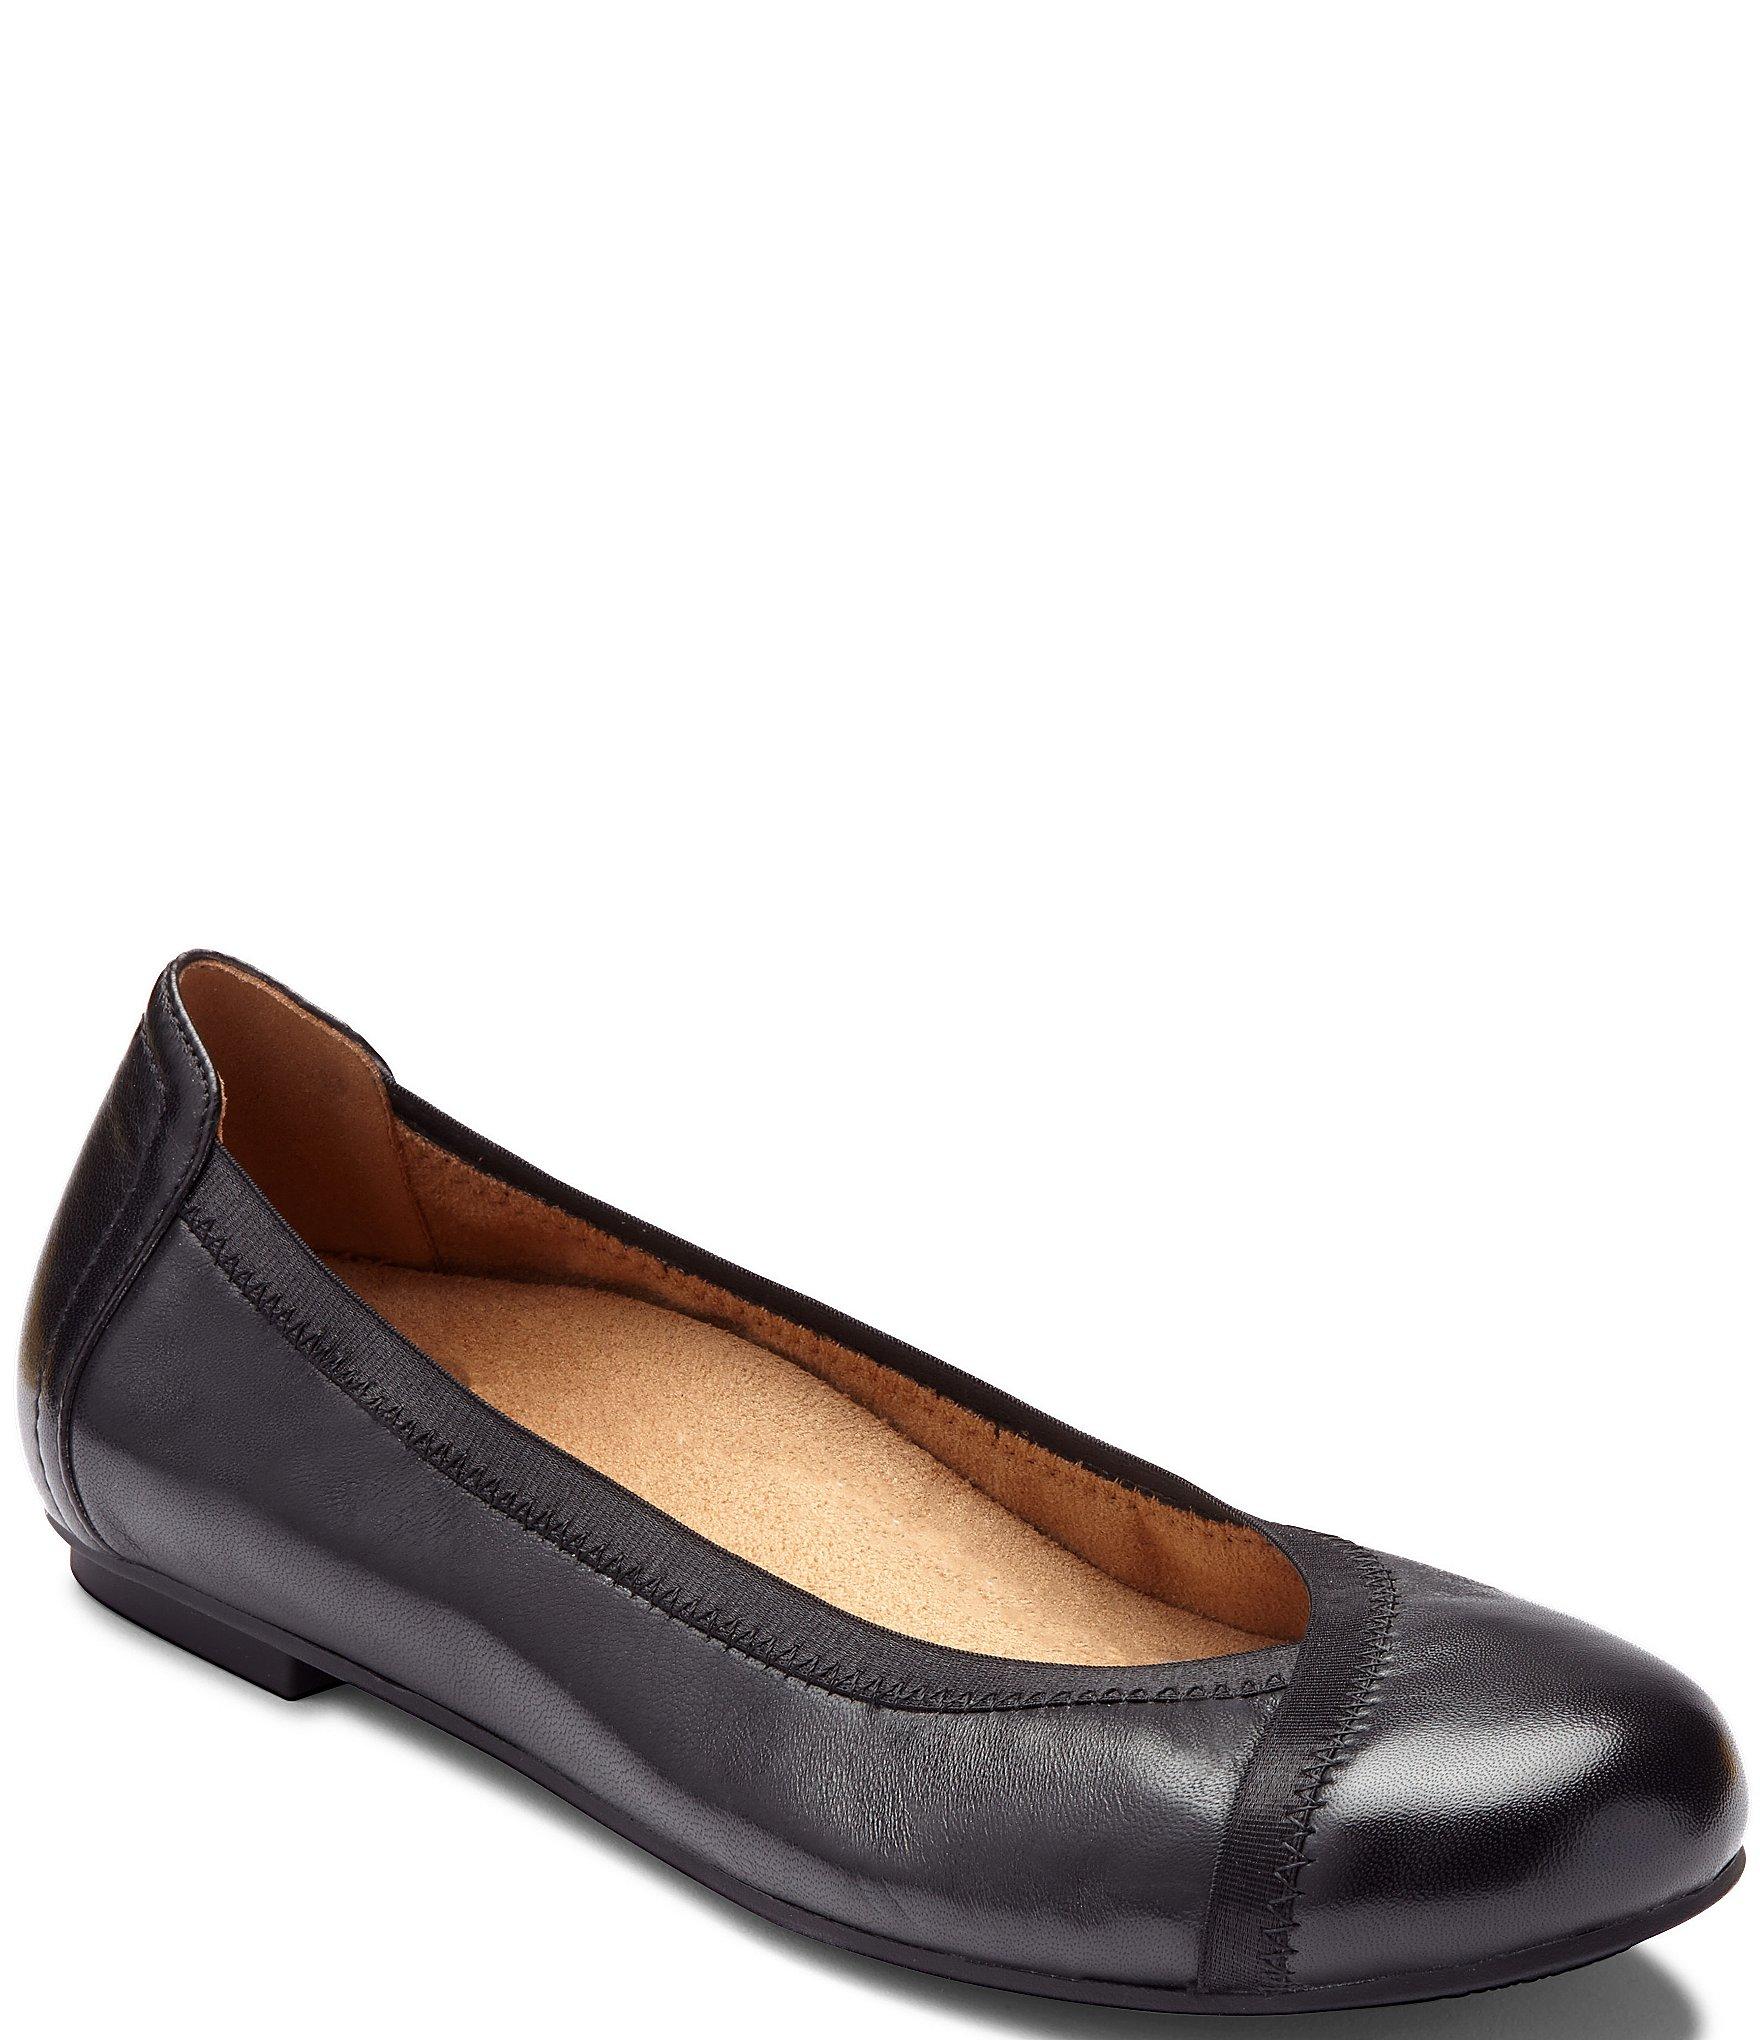 751d584d76d Vionic Caroll Leather Ballet Flats